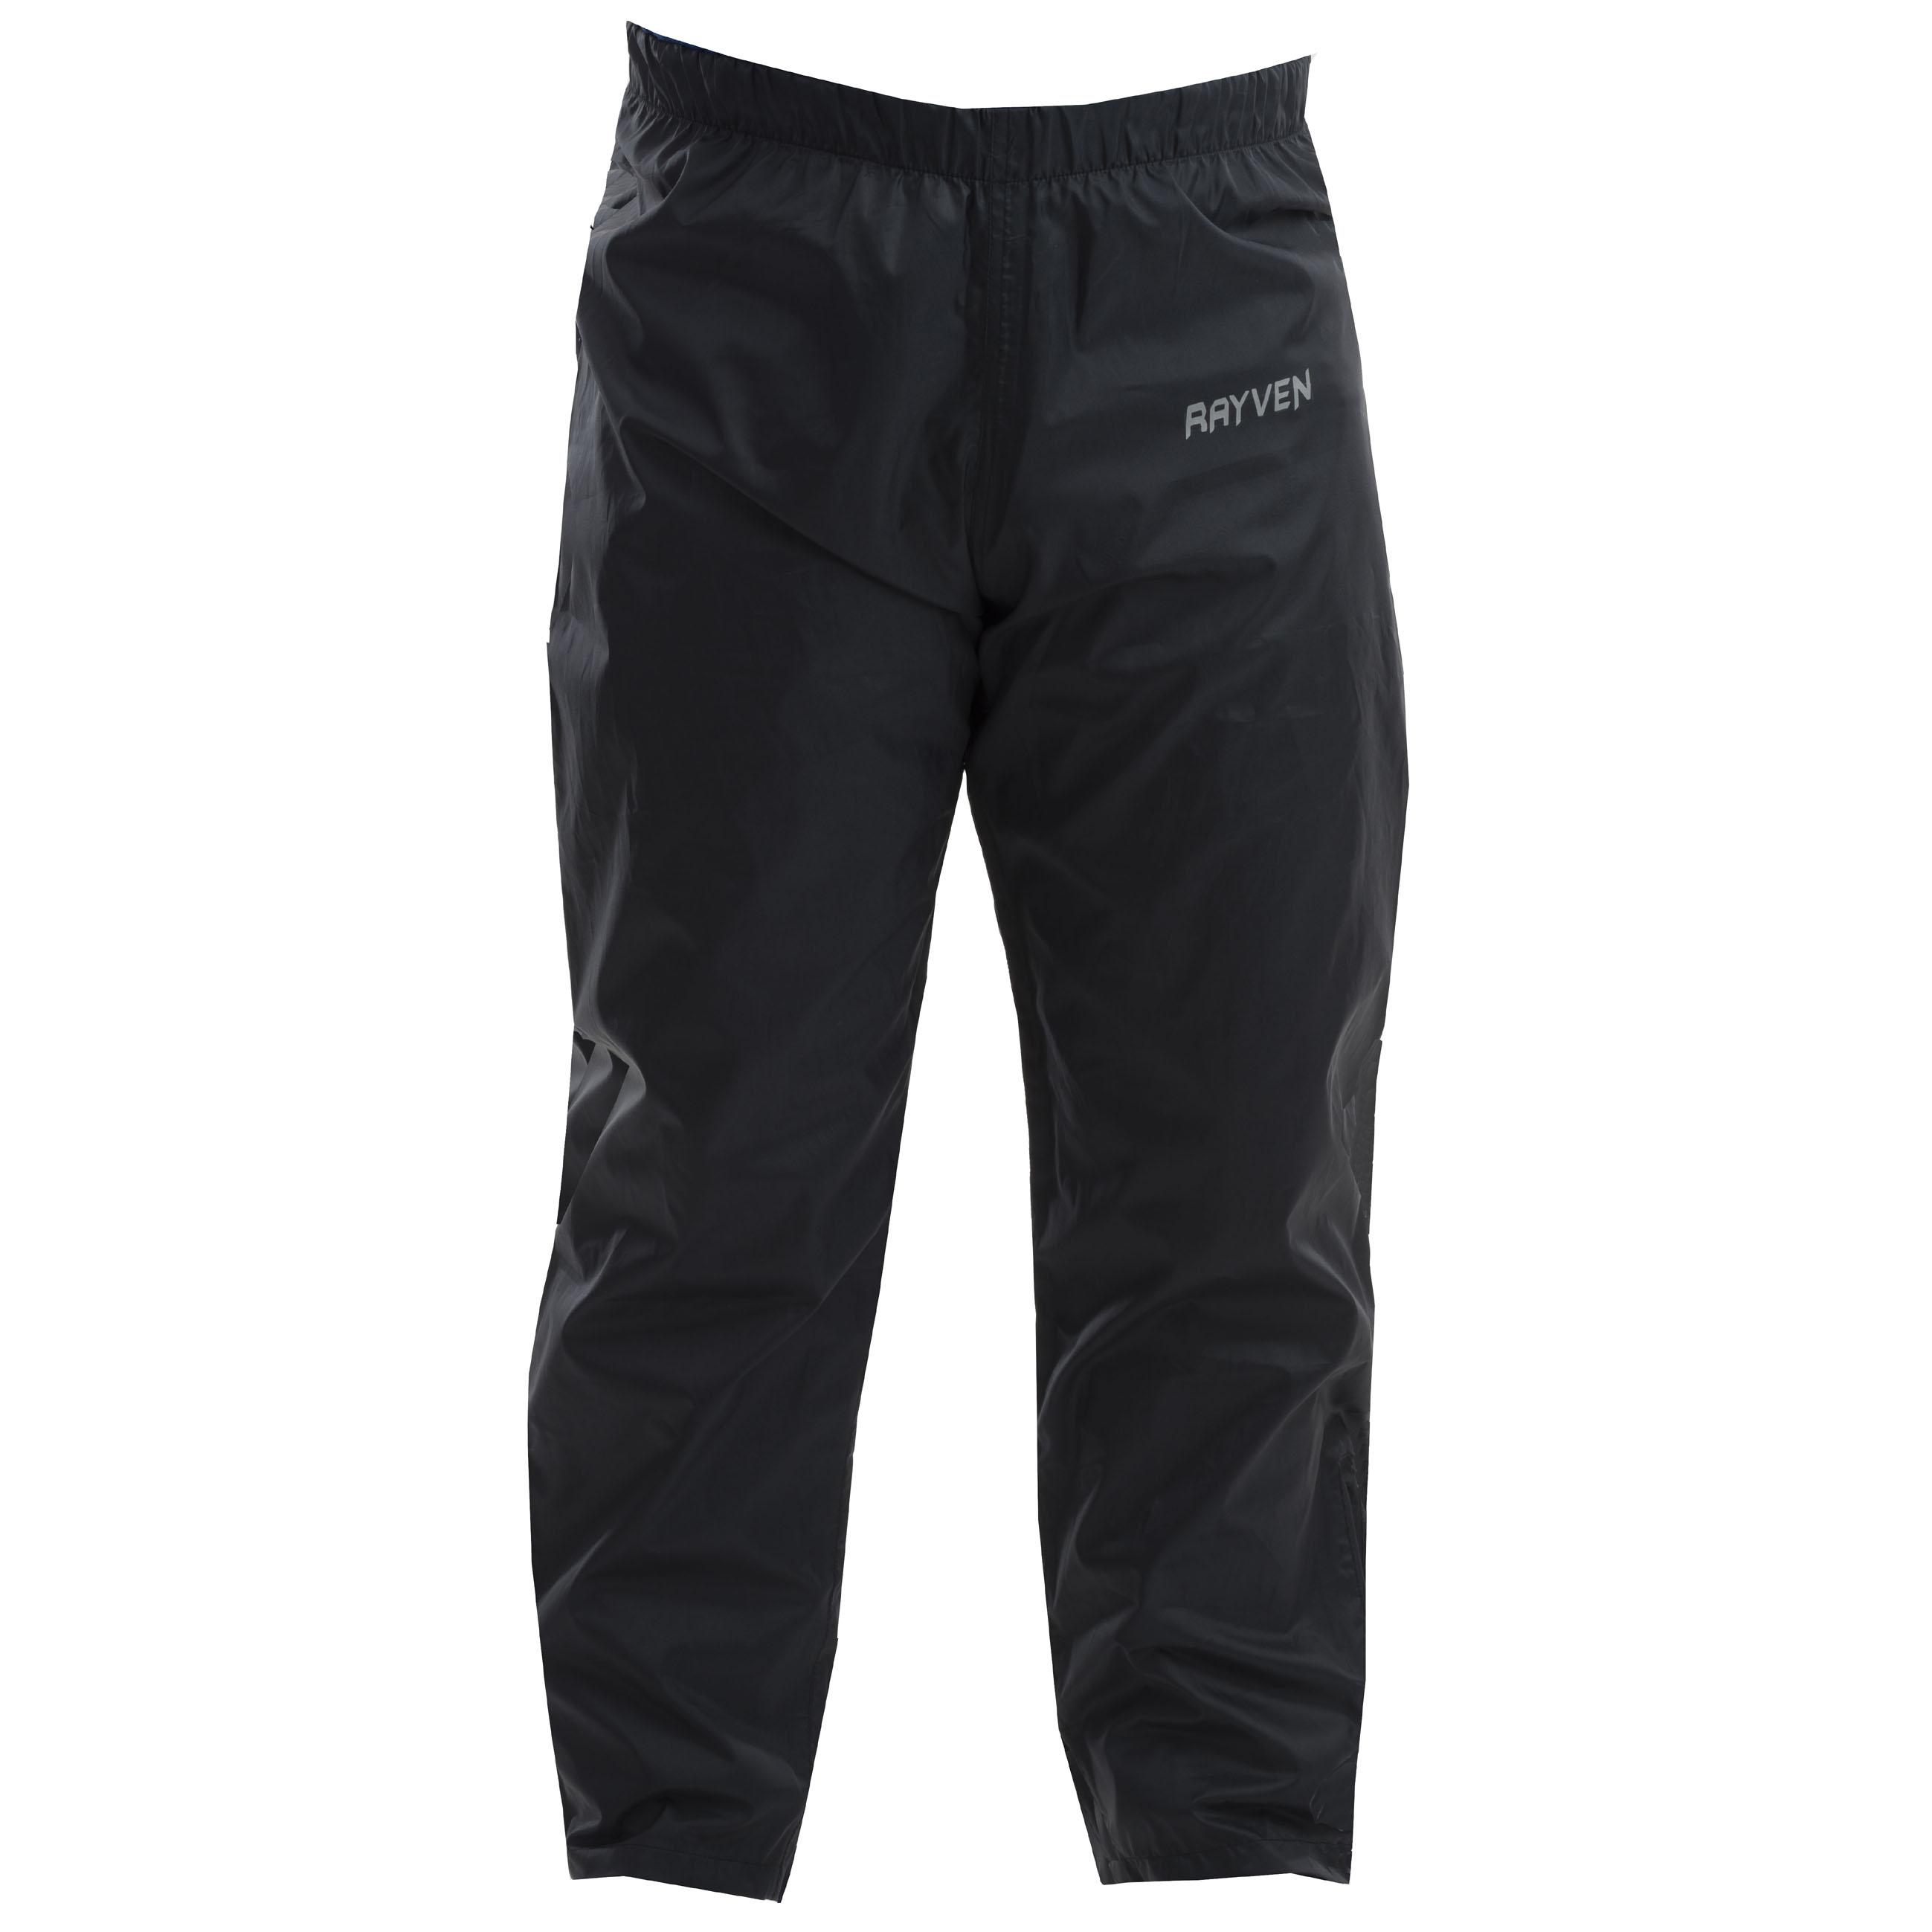 Waterproof Leather Motorcycle Trousers